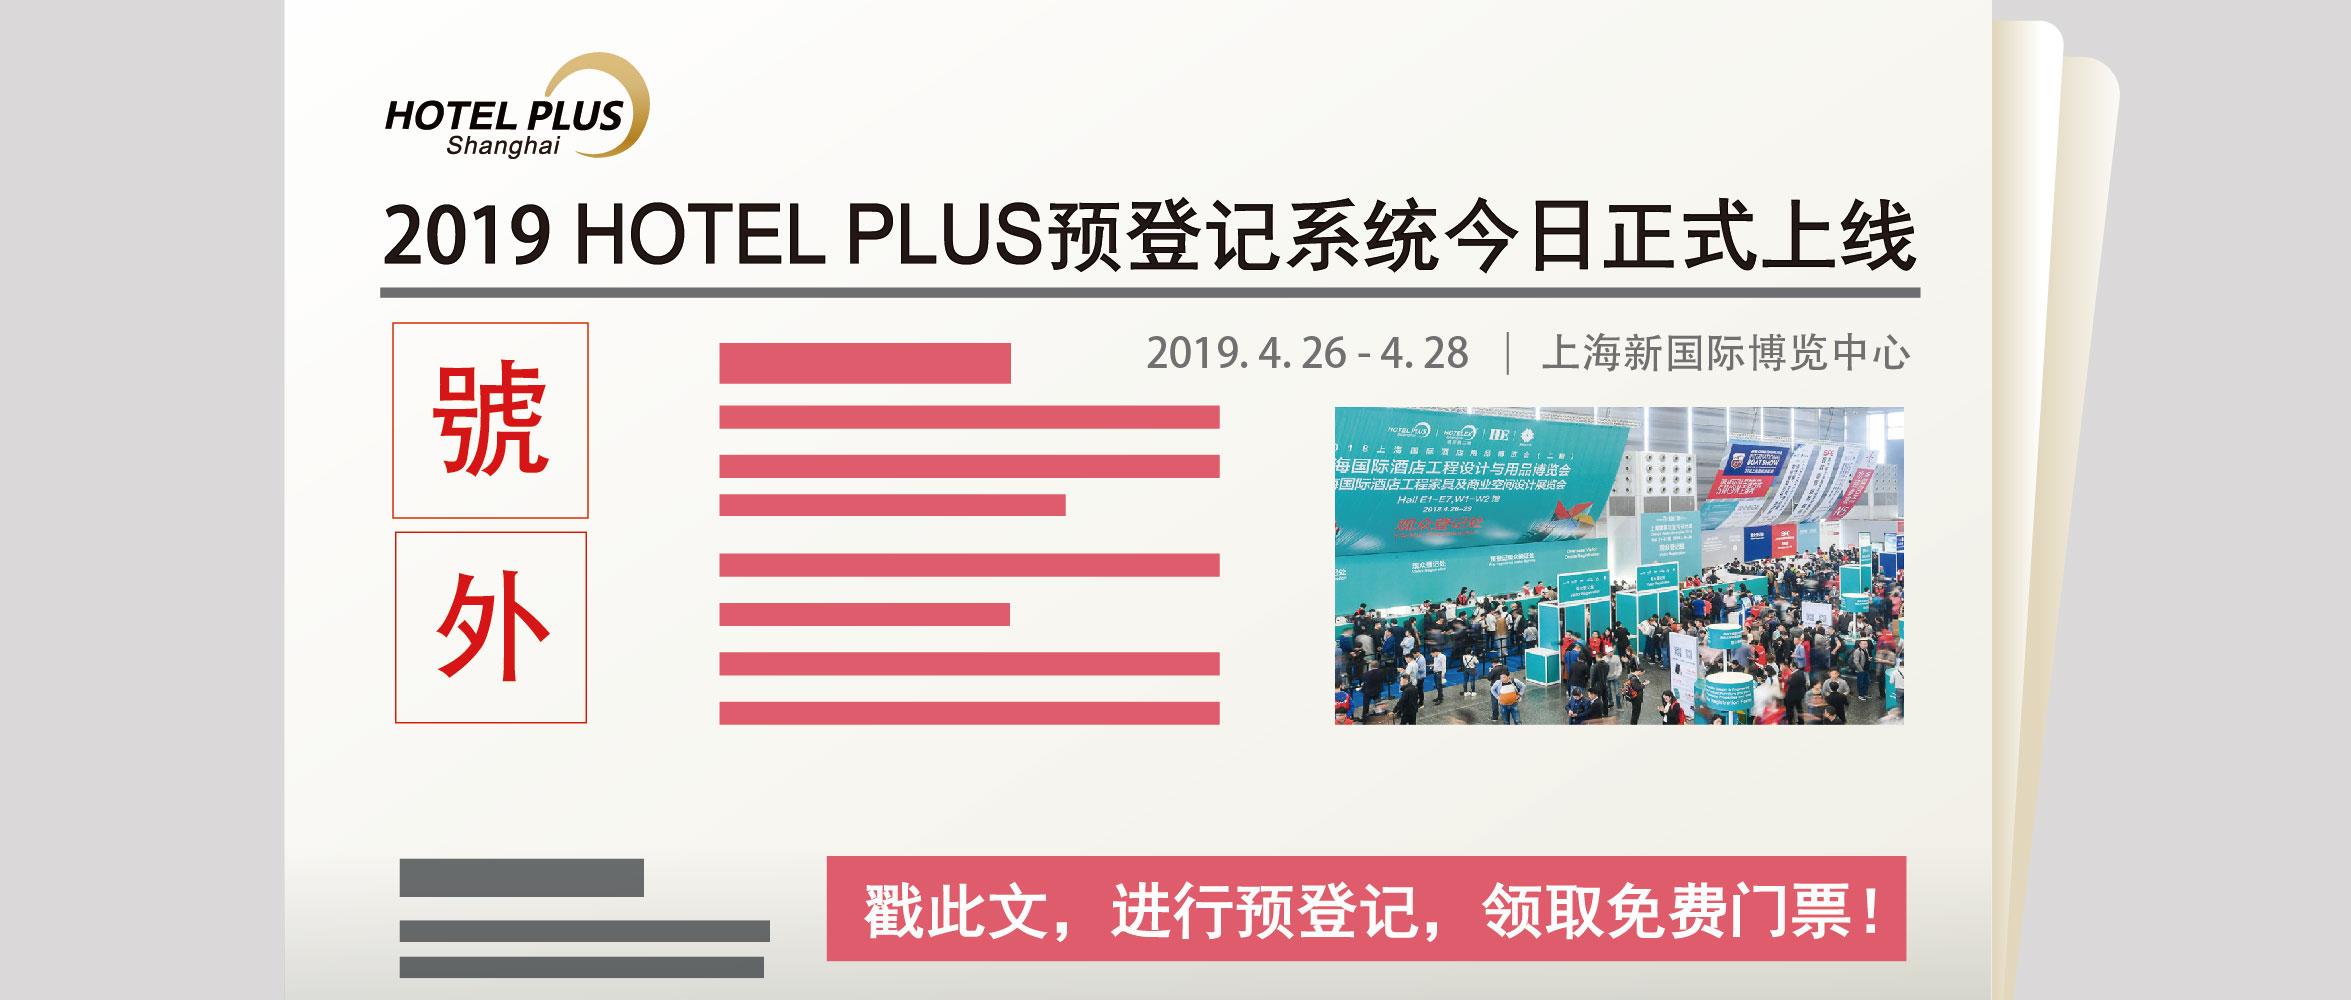 2019HOTEL PLUS上海酒店展二期观众预登记火热开启